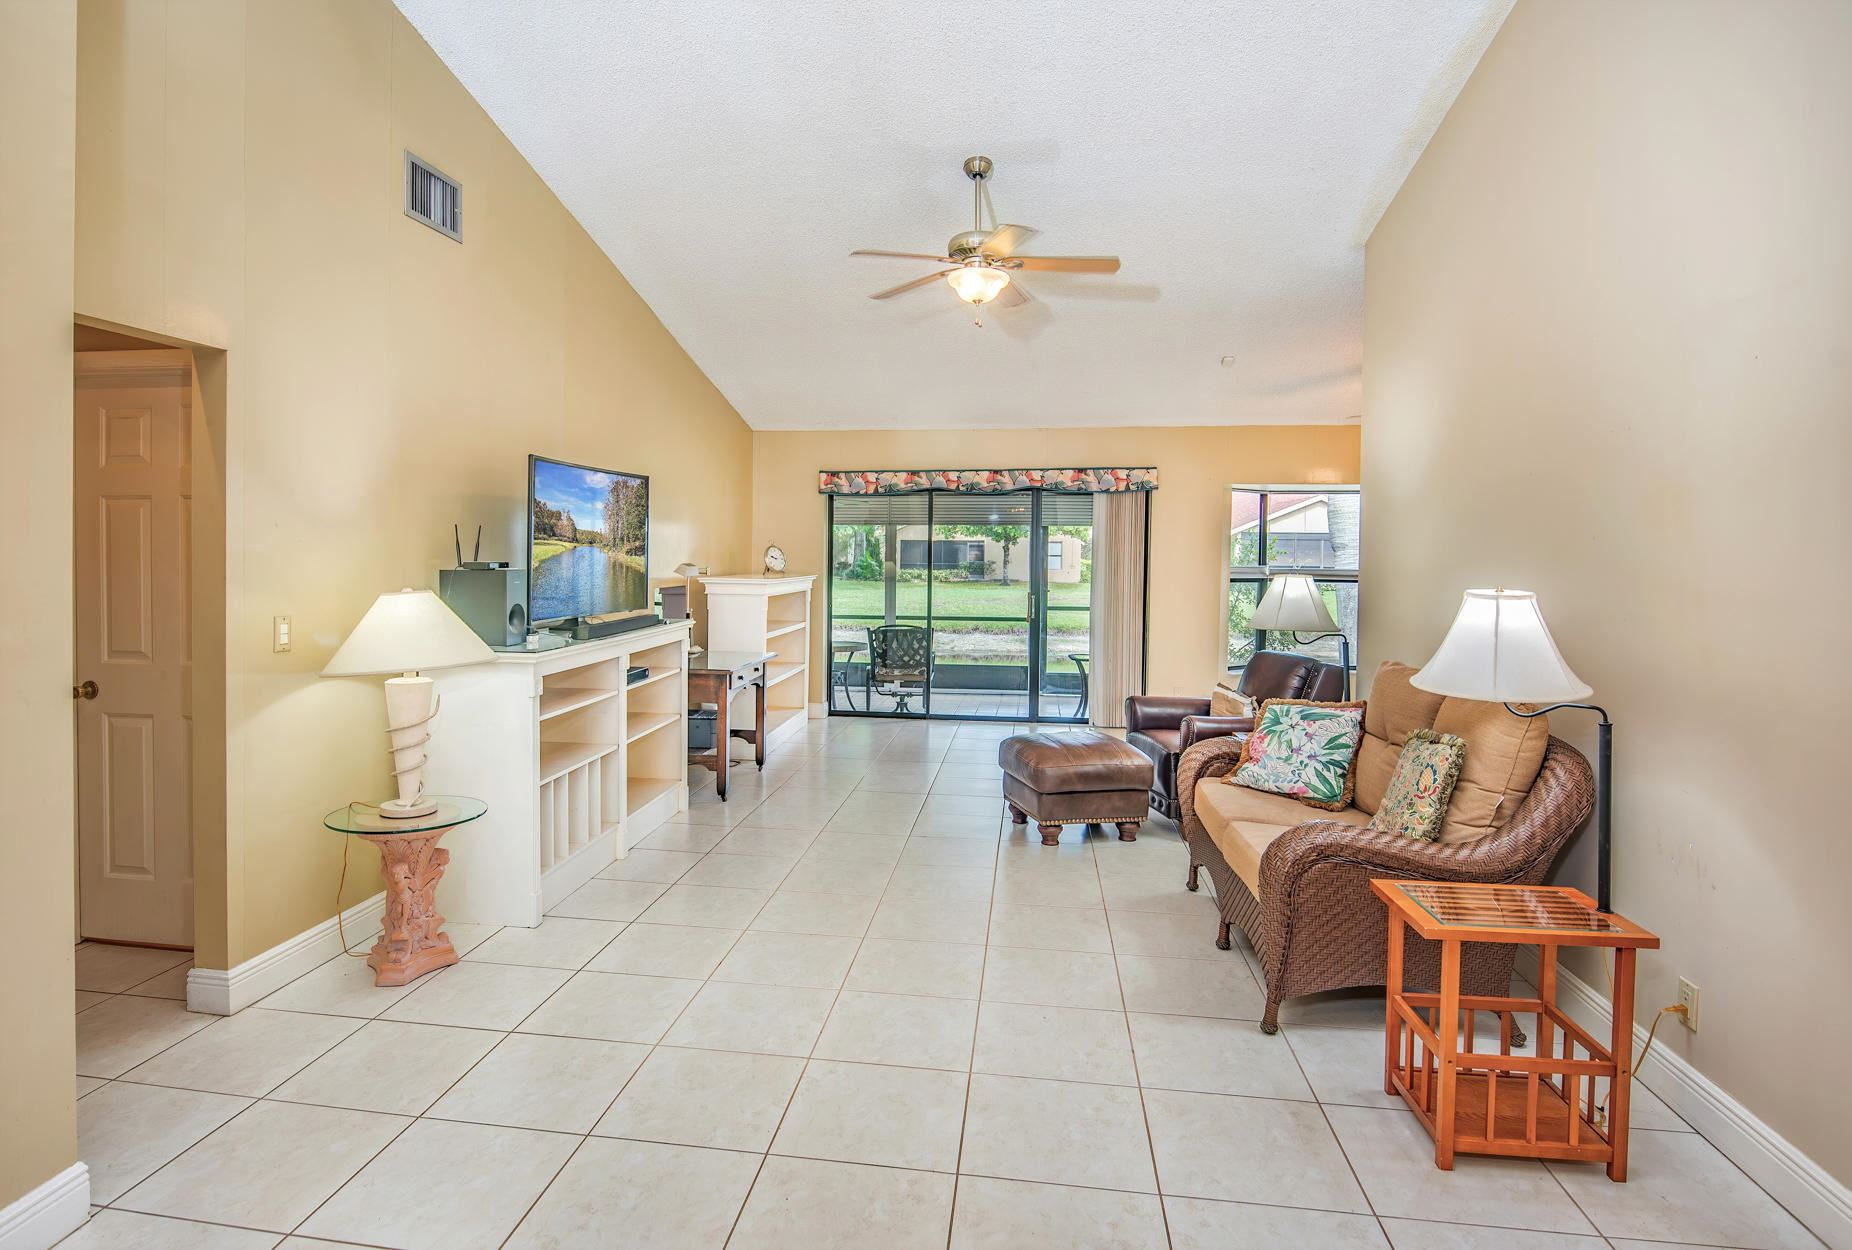 Photo of 2647 Aloe Avenue, Coconut Creek, FL 33063 (MLS # RX-10715689)